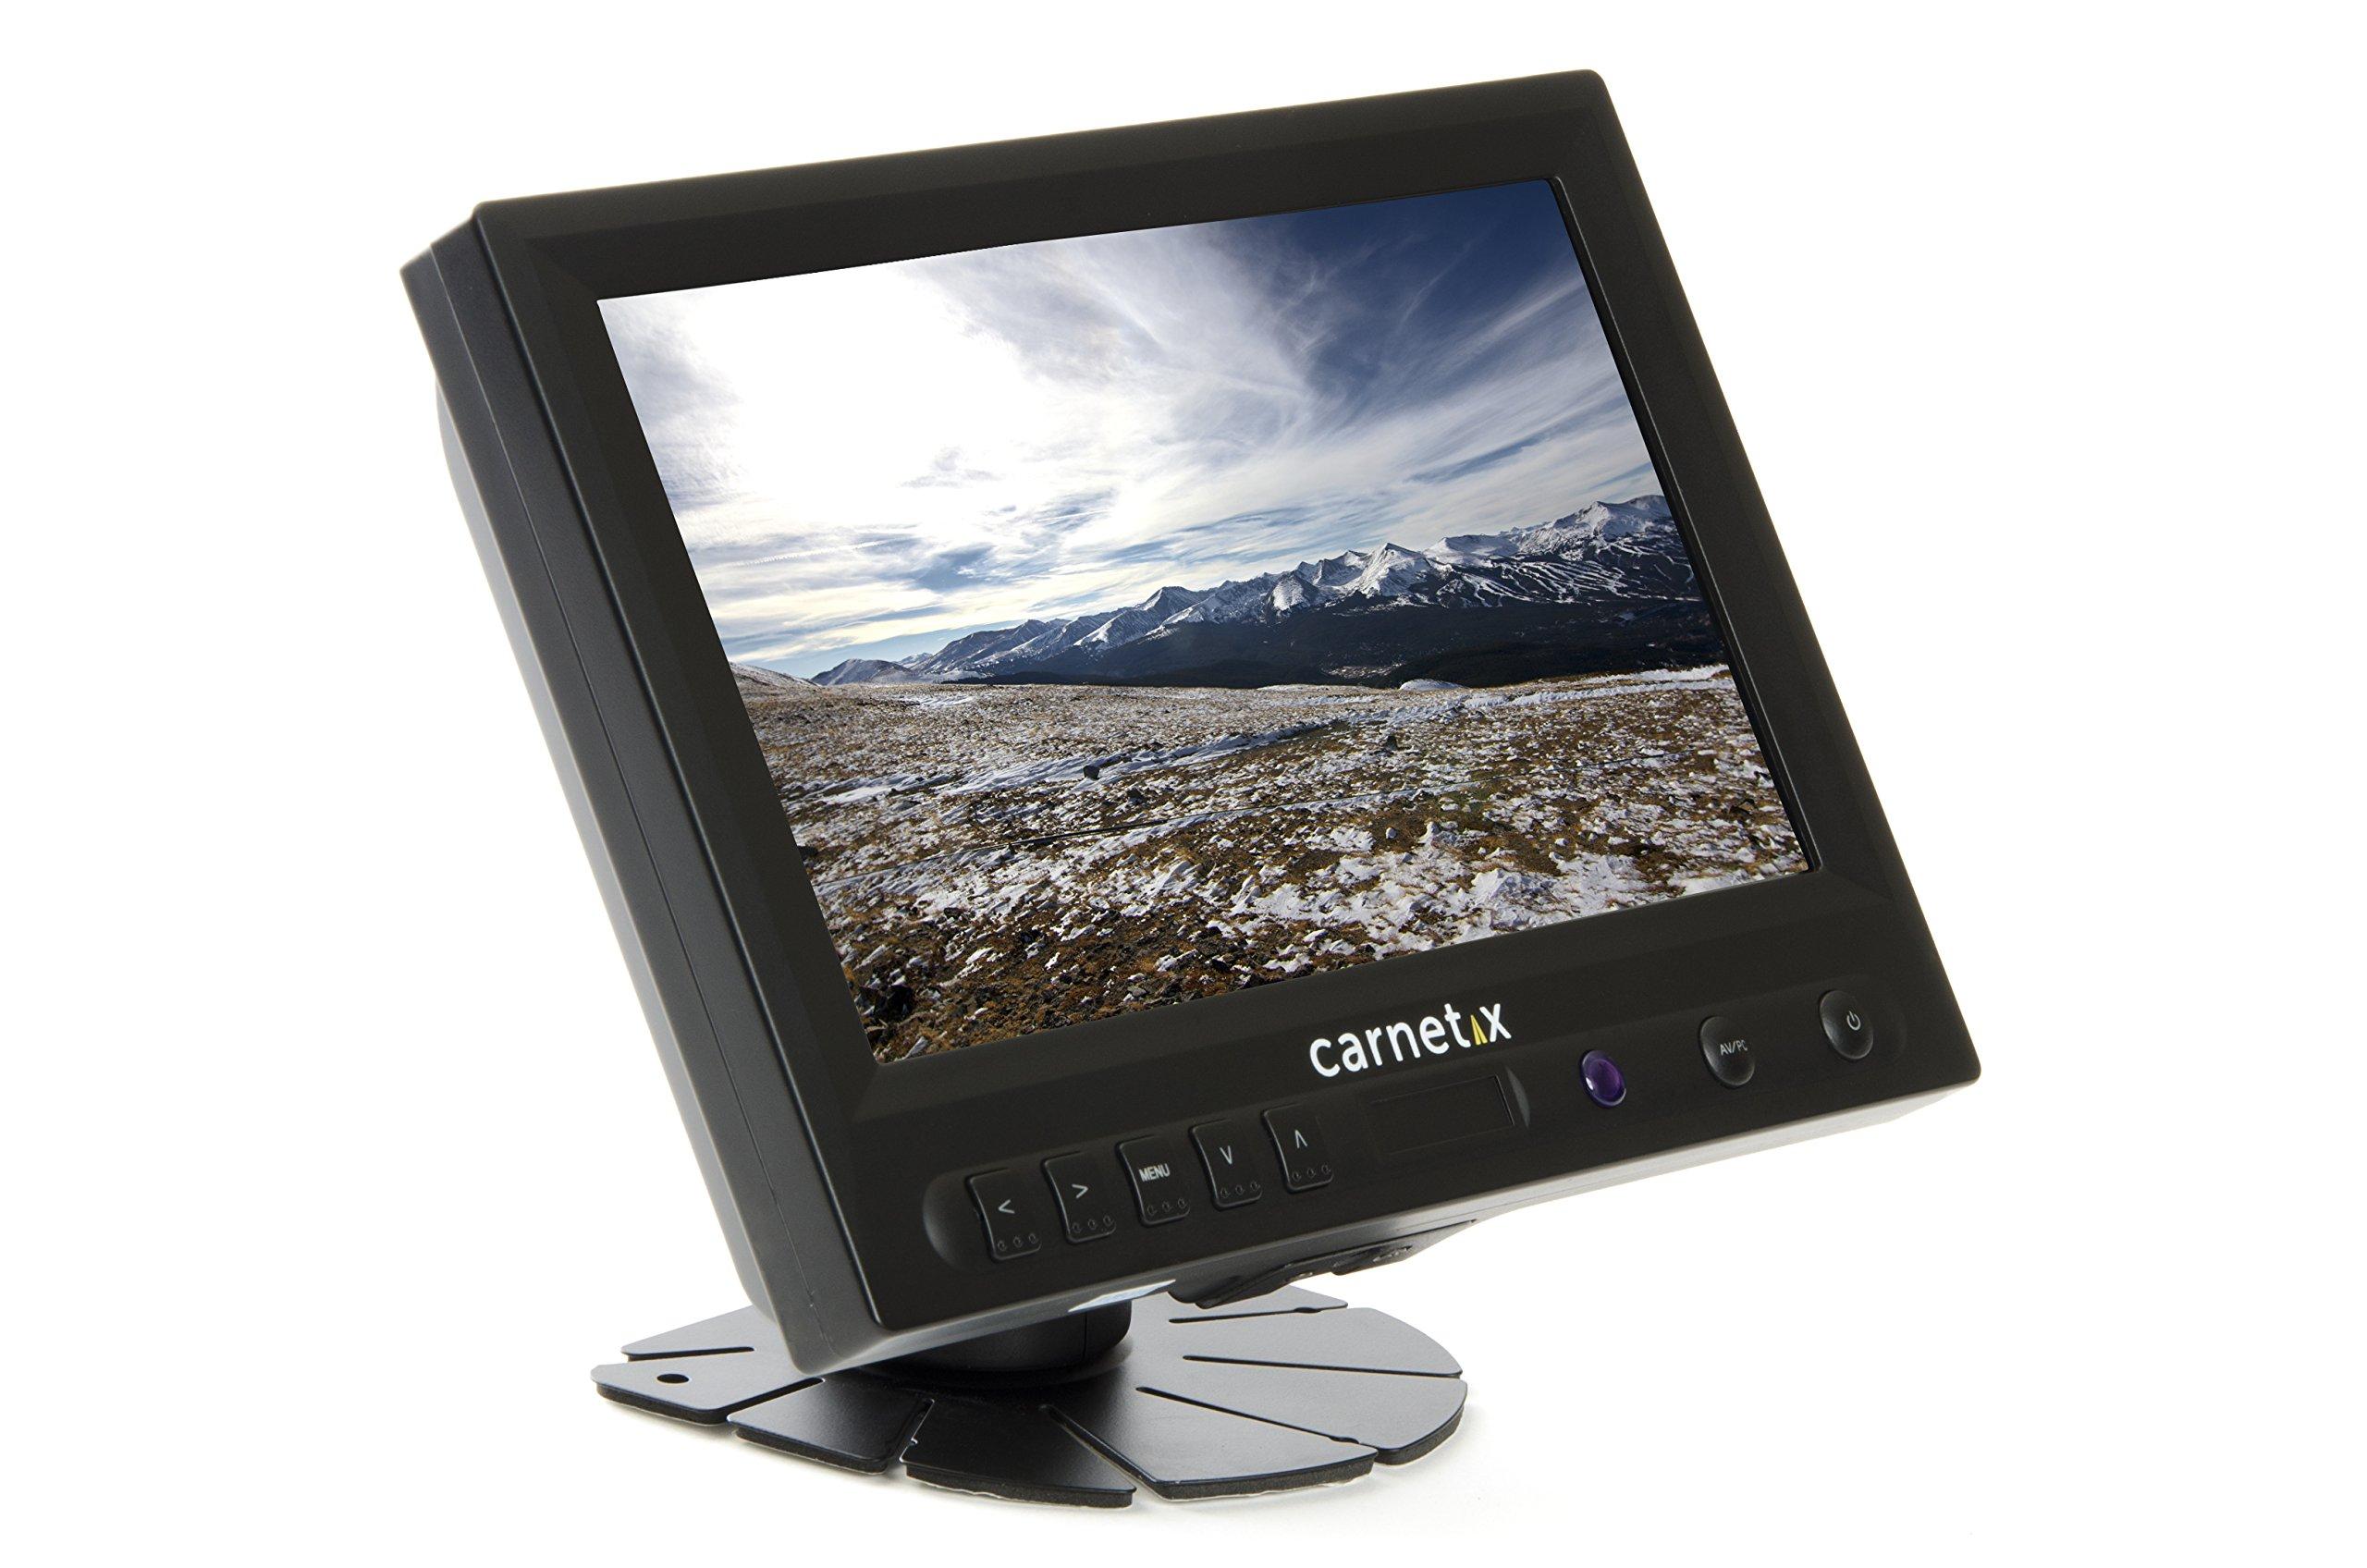 CarNetix 8'' HDMI VGA Touch Screen Monitor High Brightness